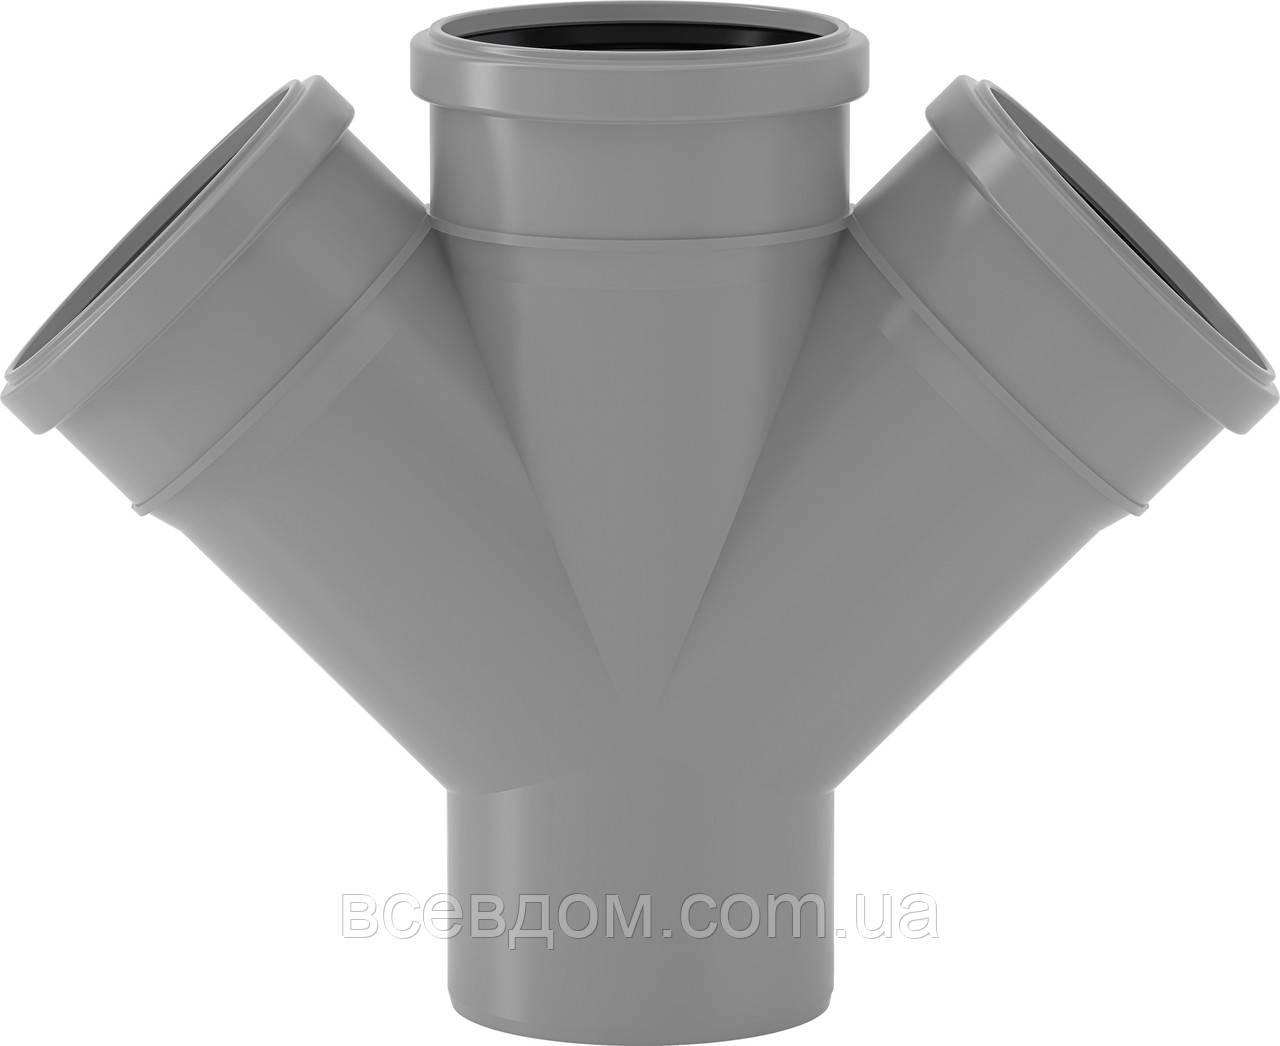 HDTA крестовина Valsir внутренней канализации 110/50/50х45°